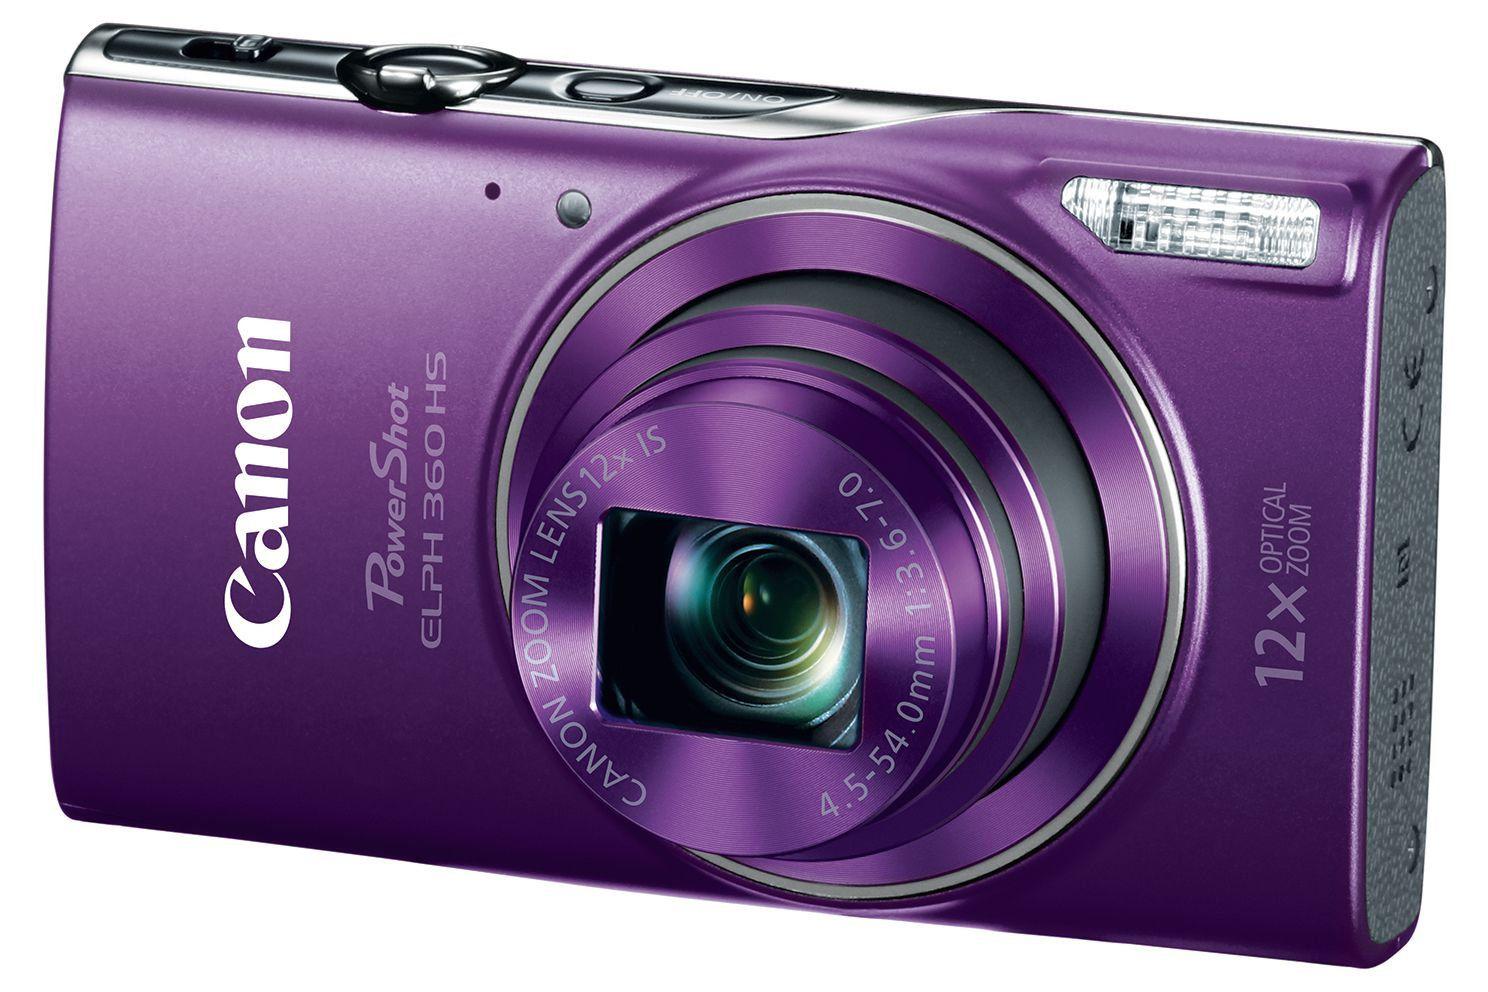 Canon PowerShot ELPH 360 Review